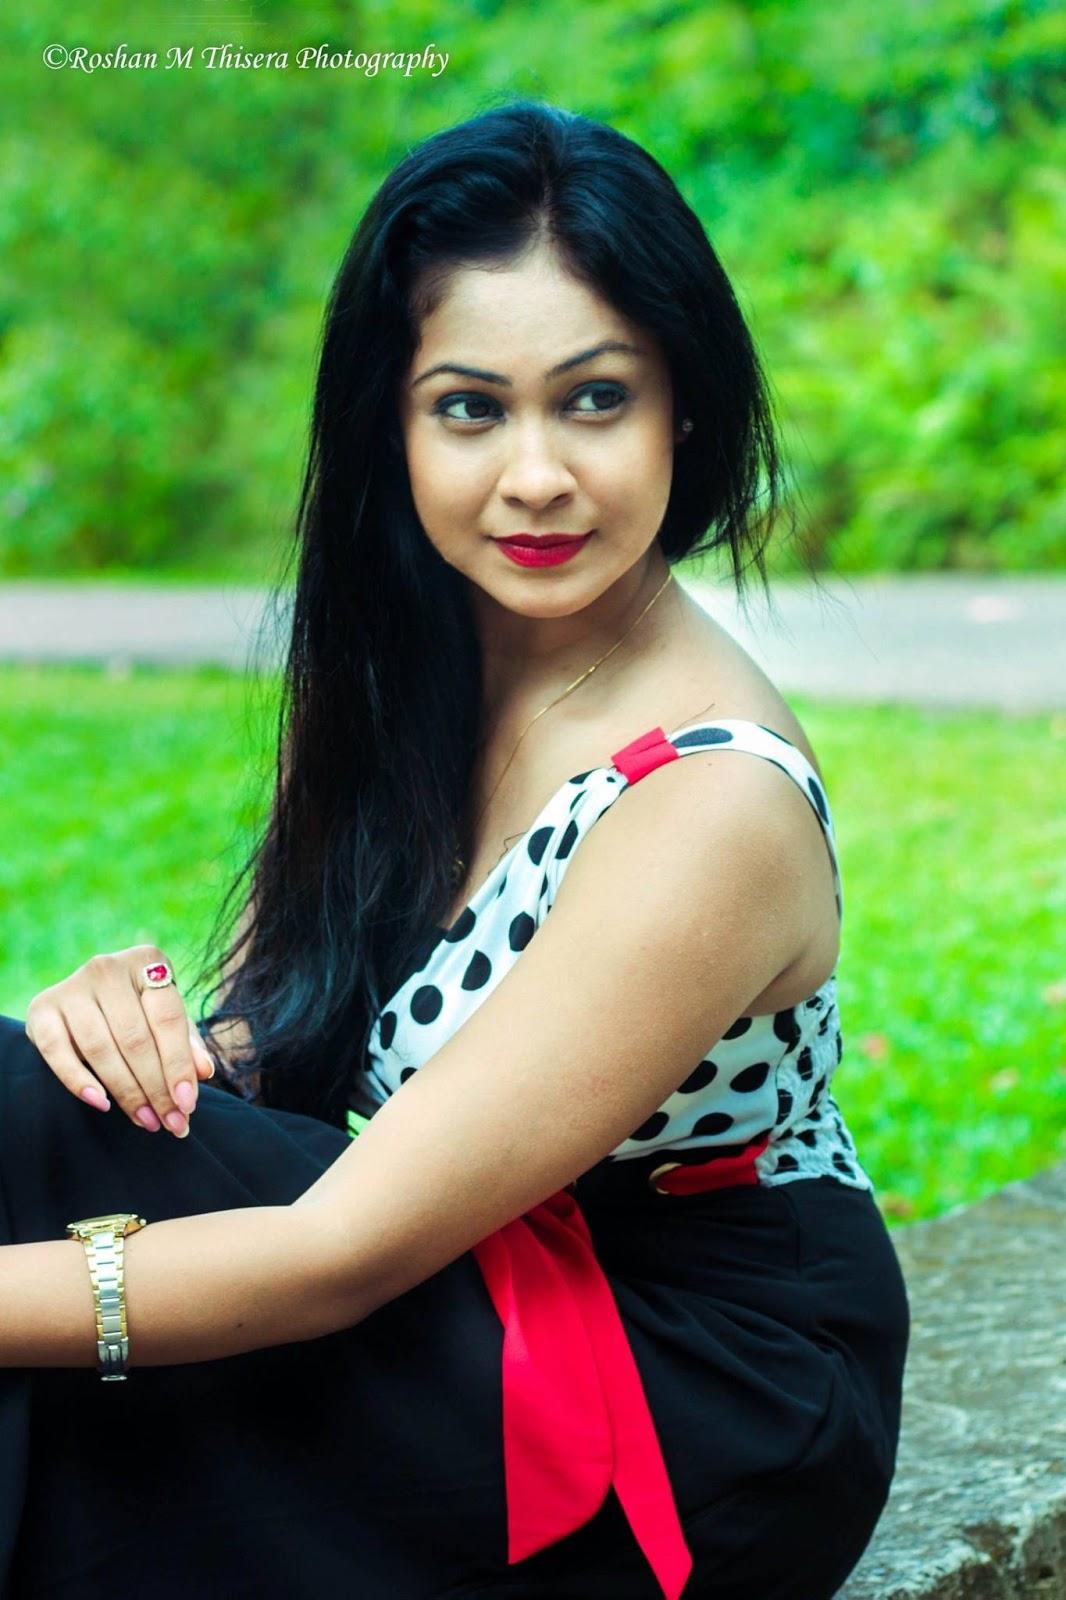 Rangi Rajapaksha - Srilanka Models Zone 24x7